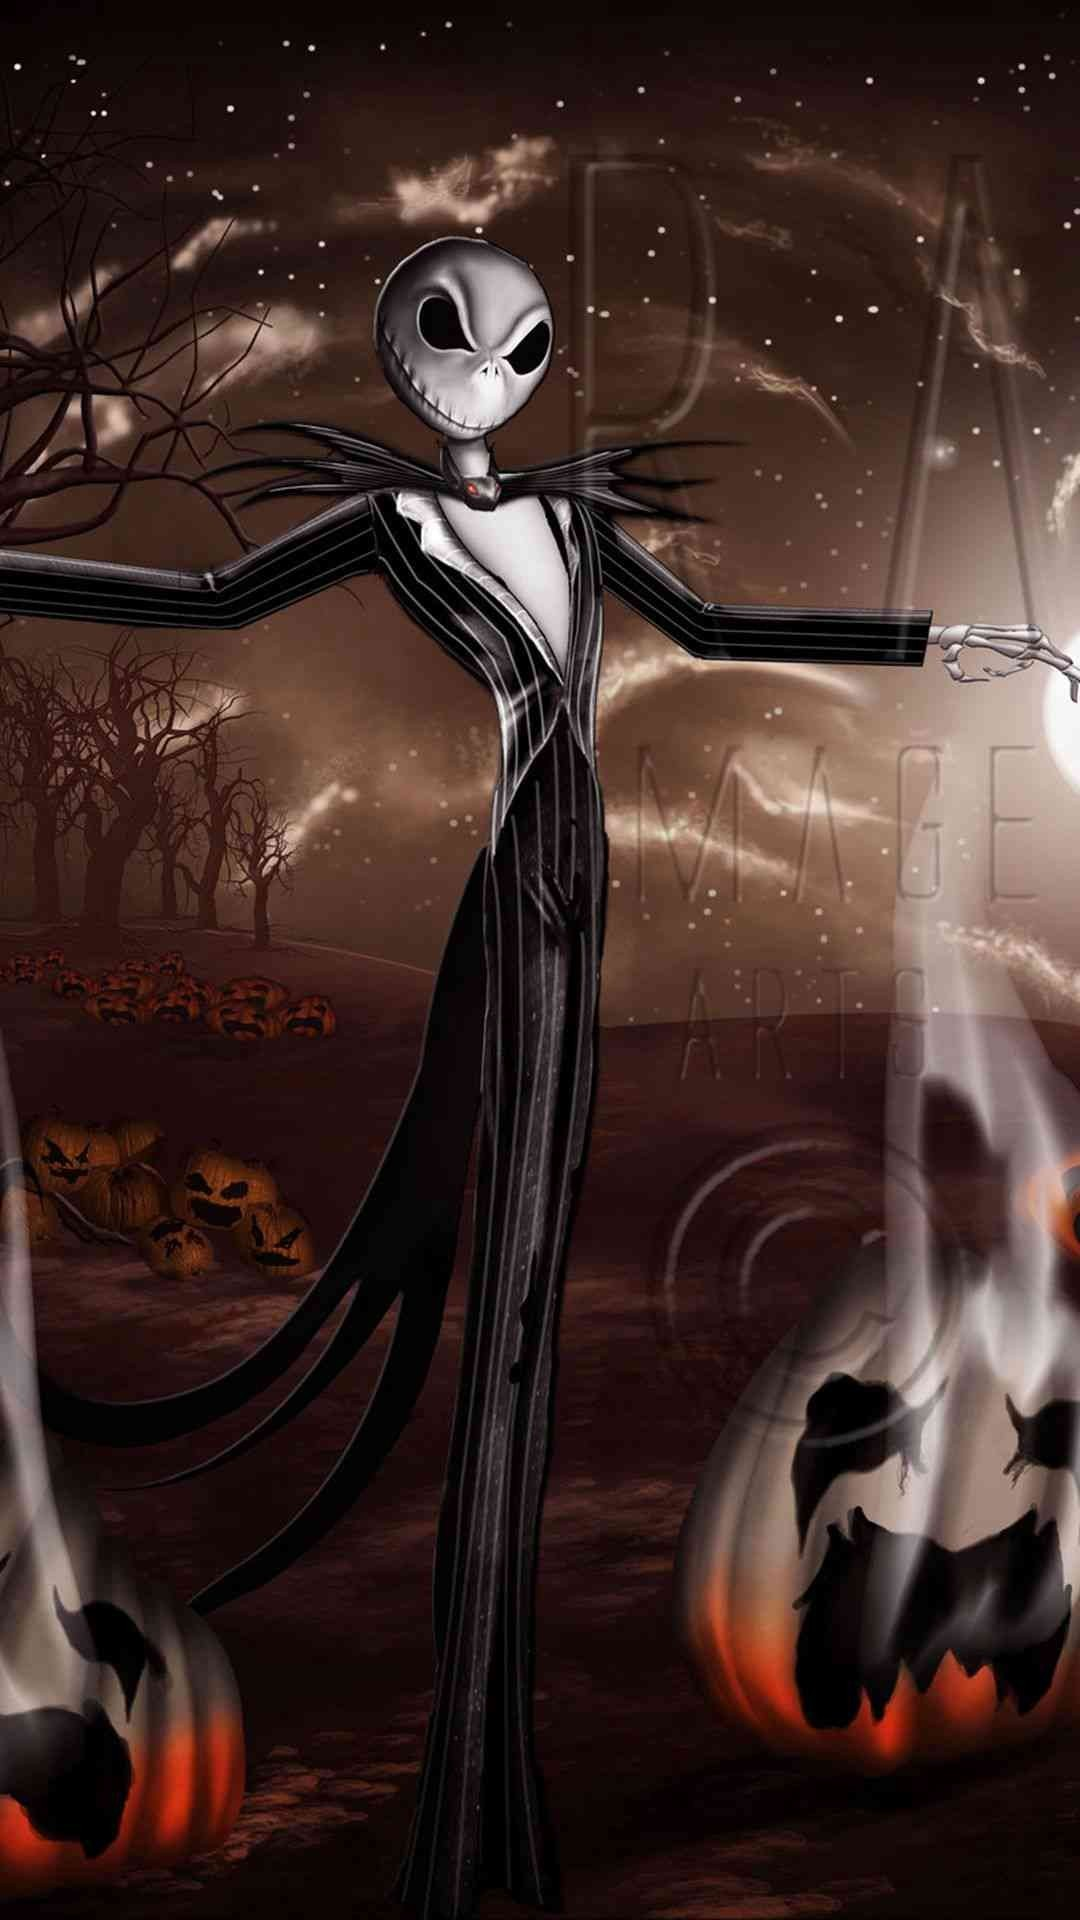 Crazy Jack Skellington Pumpkin 2014 Halloween iPhone 6 plus Wallpapers –  Night Before Christmas, Tim